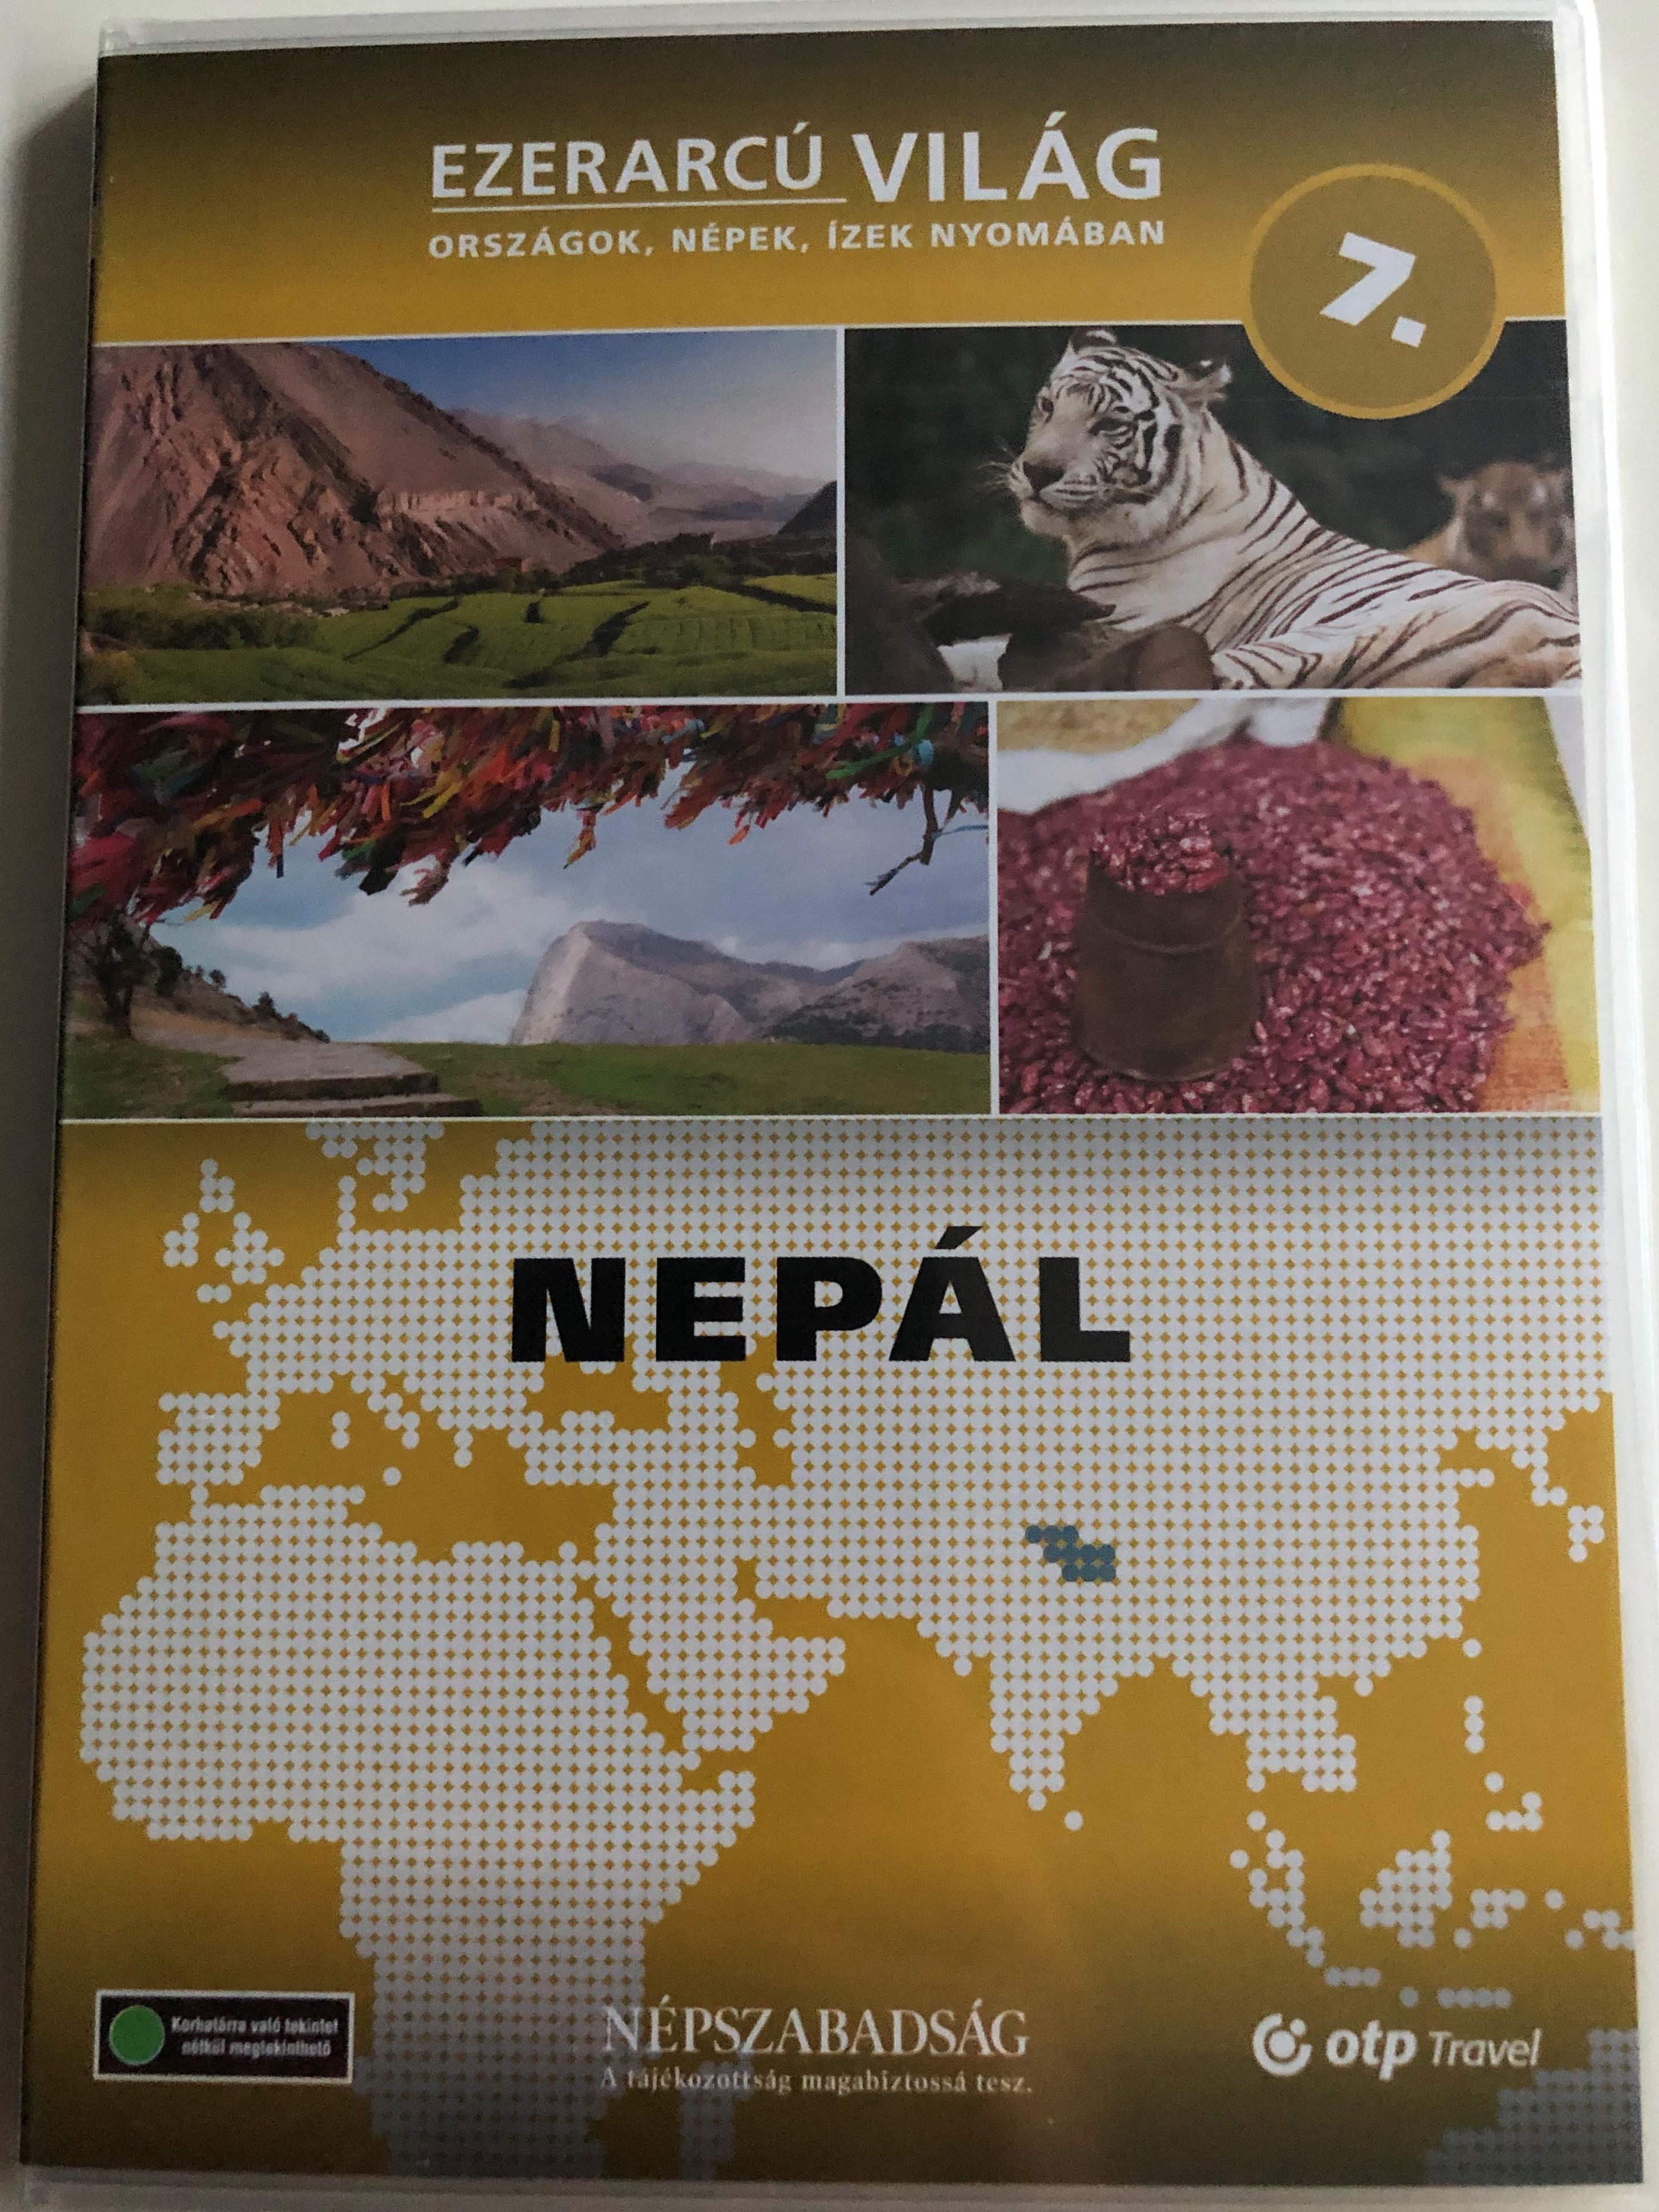 ezerarc-vil-g-vol.-7-nepal-dvd-2009-orsz-gok-n-pek-zek-nyom-ban-20-x-dvd-set-2009-n-pszabads-g-premier-media-pilot-film-documentary-series-about-our-world-1-.jpg